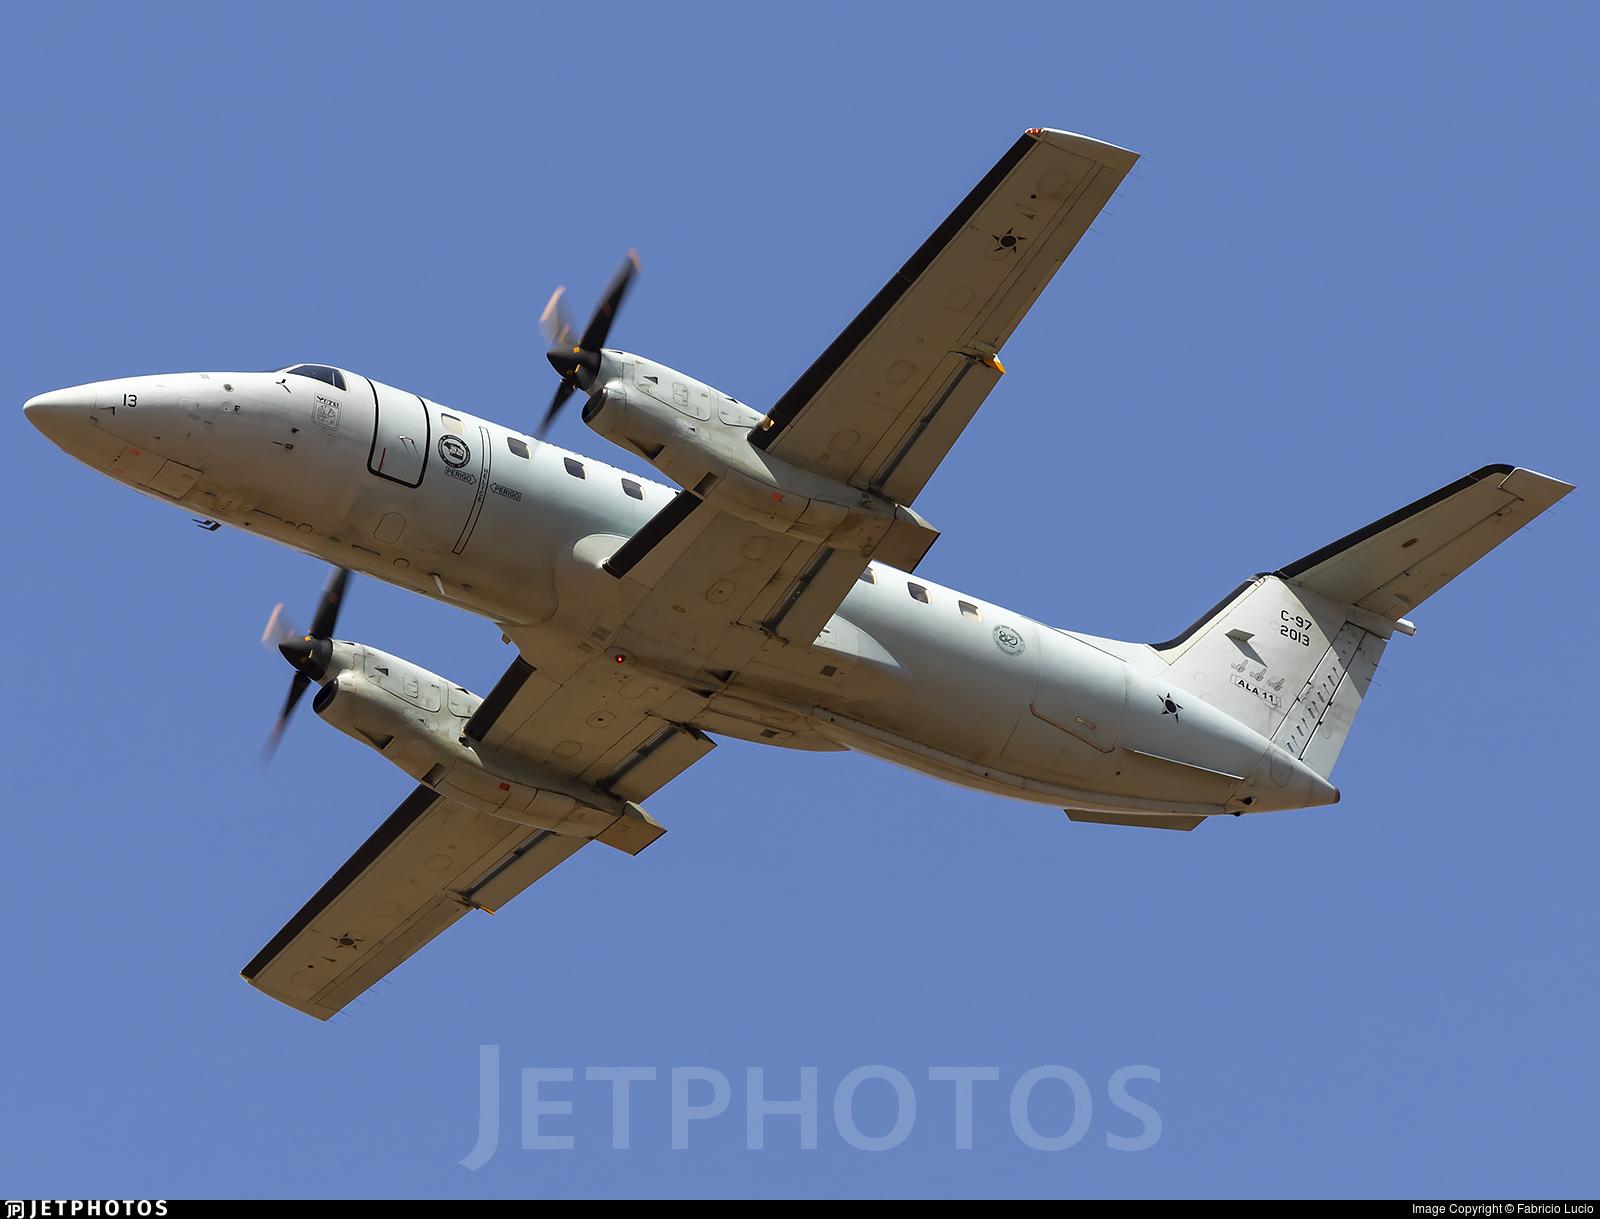 FAB2013 - Embraer C-97 Brasilia - Brazil - Air Force